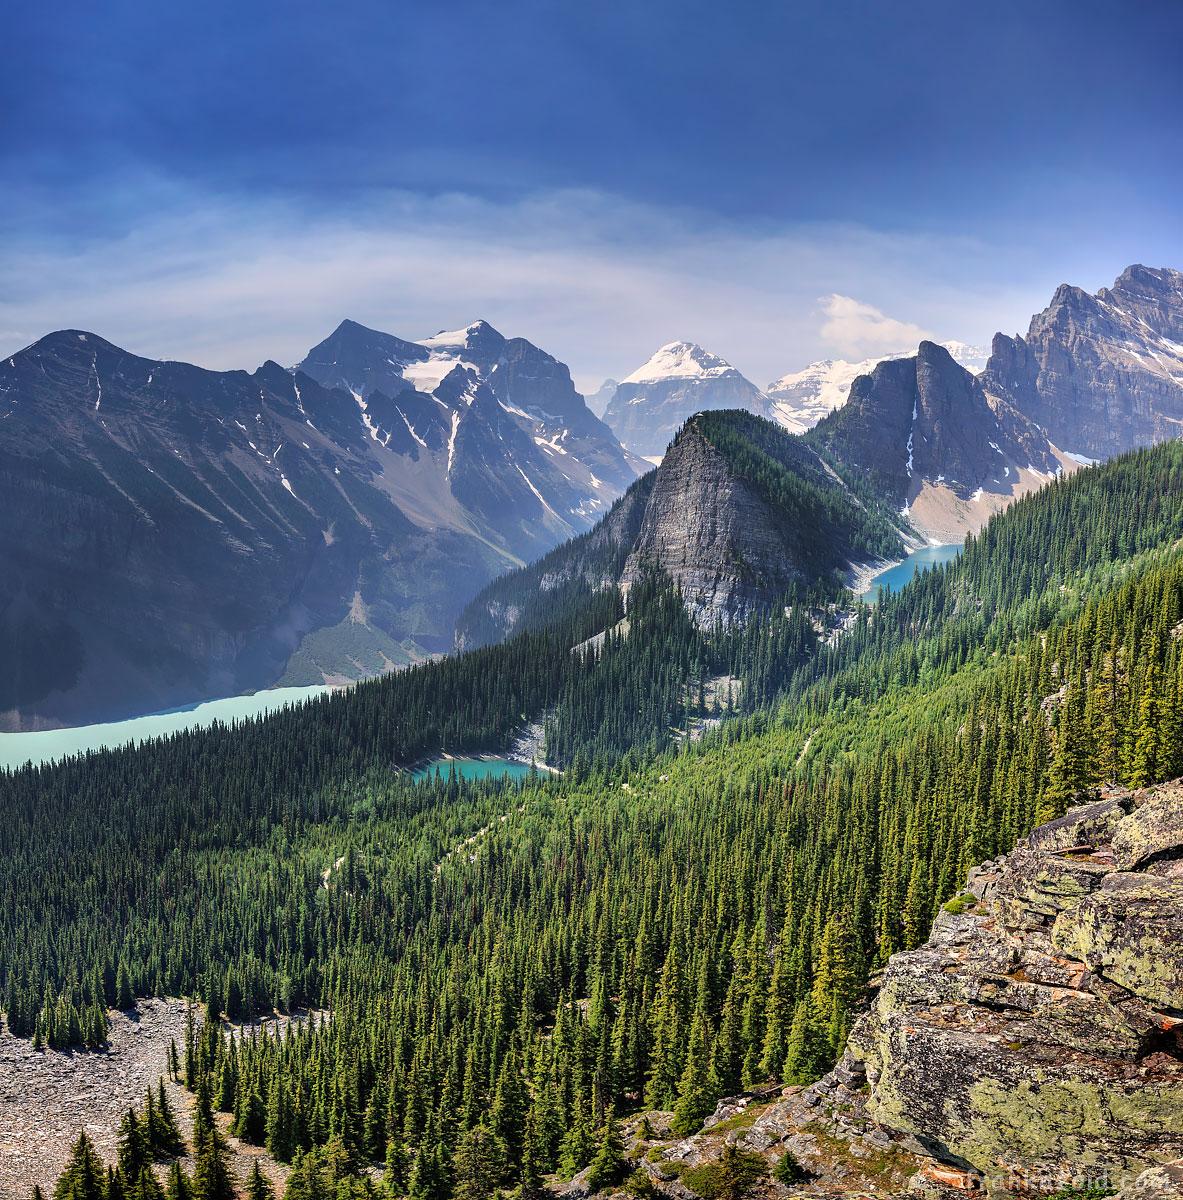 Alberta, Canada 2017 photo